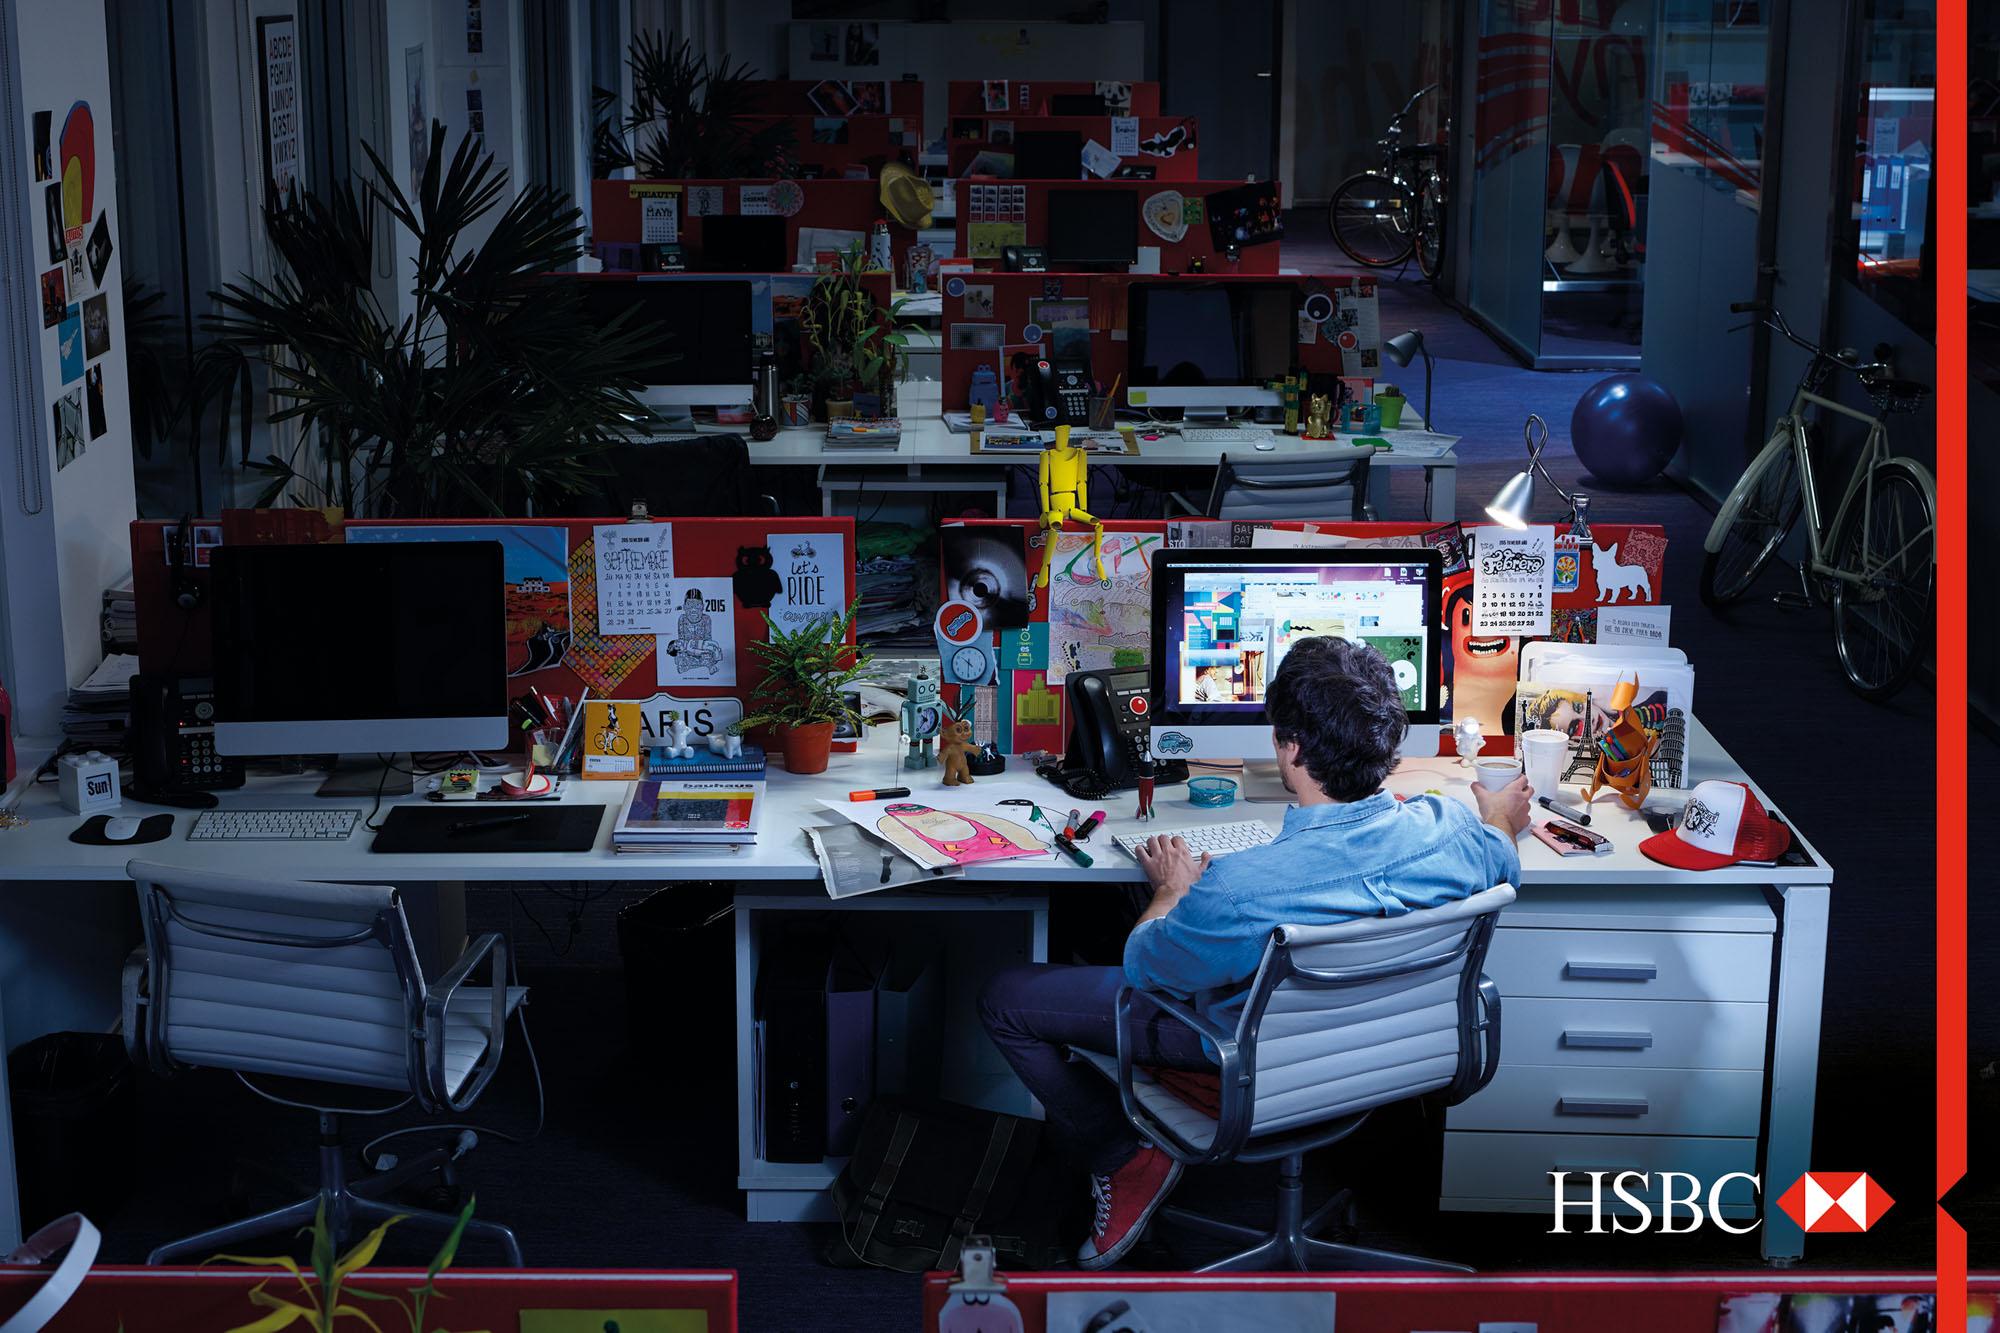 henrik-knudsen-advertising-hsbc-07.jpg